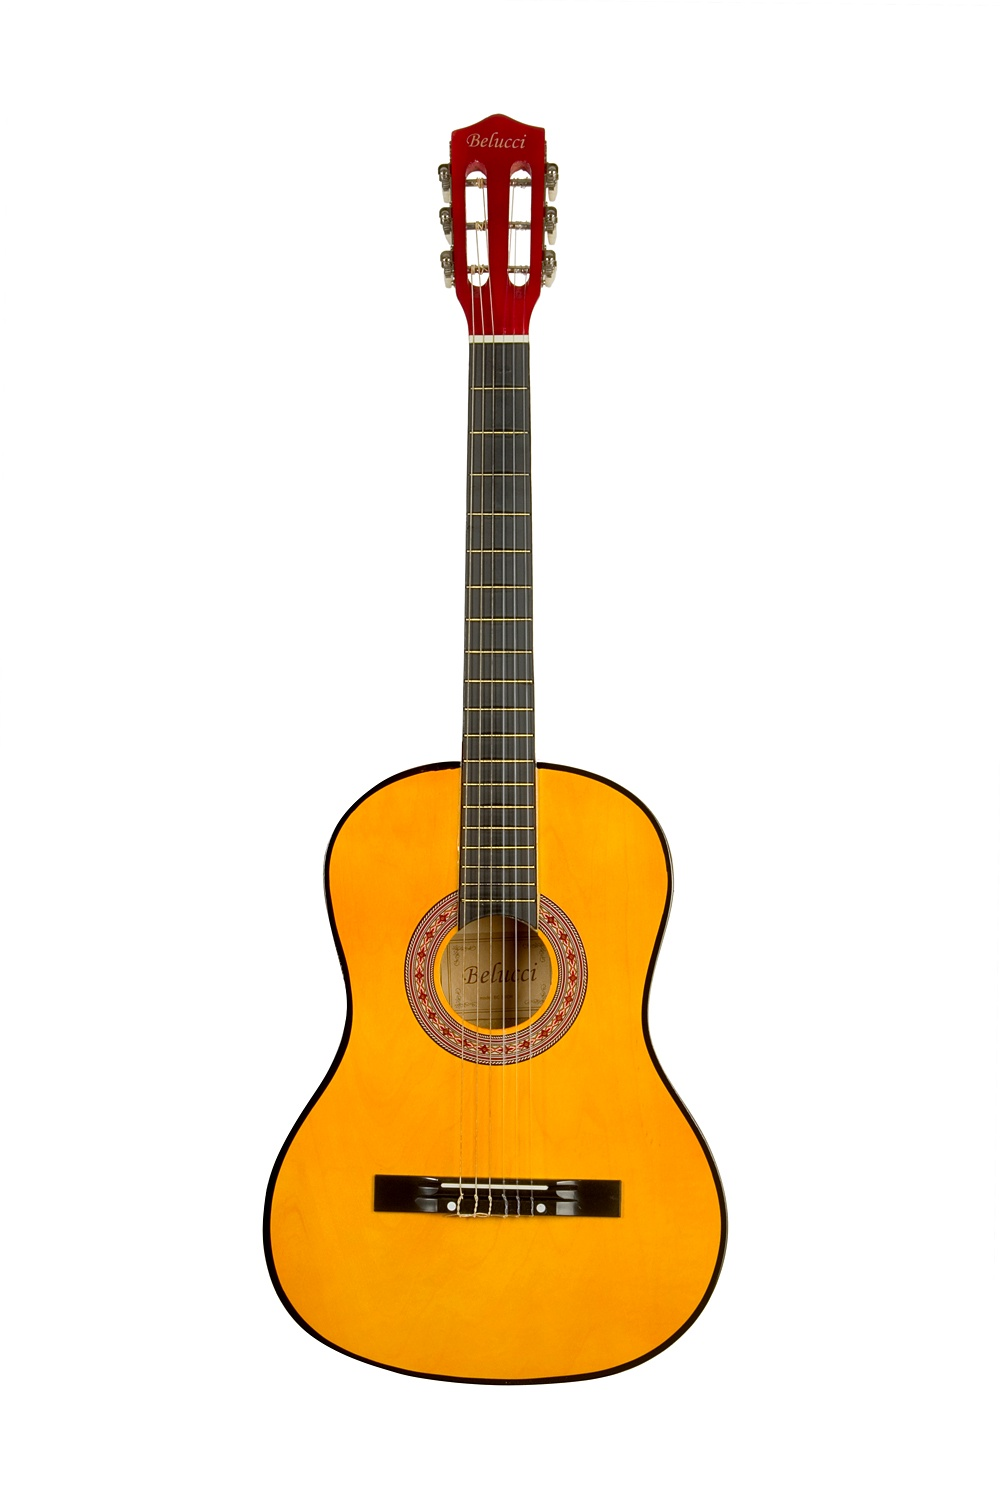 Belucci-BC3805-Orange-klassicheskaya-gitara-150945713